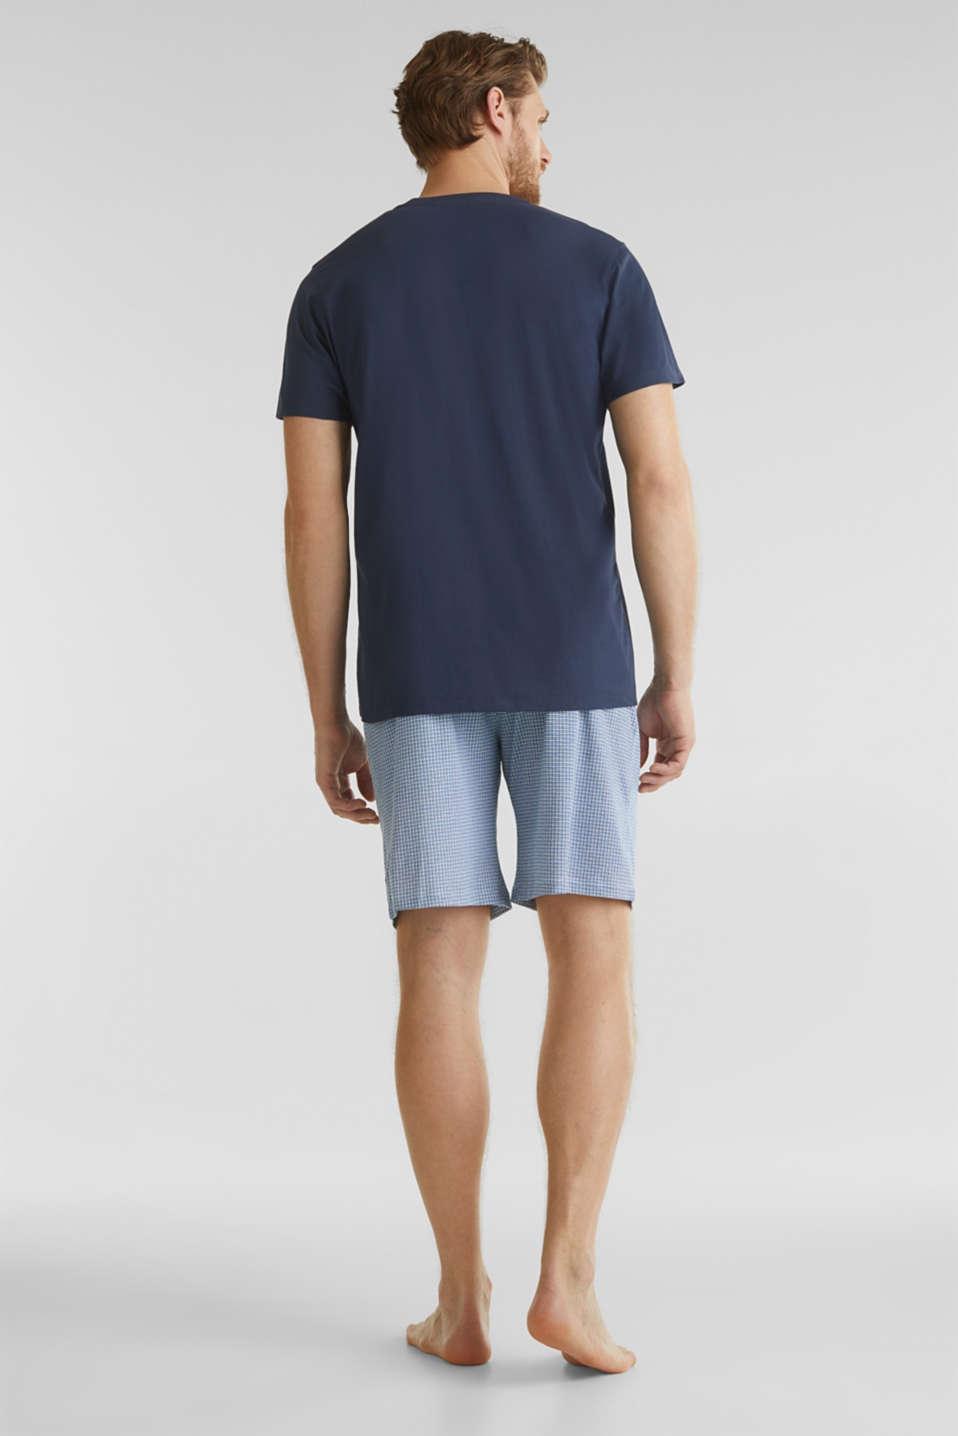 Jersey pyjamas with checks, 100% cotton, NAVY 2, detail image number 1